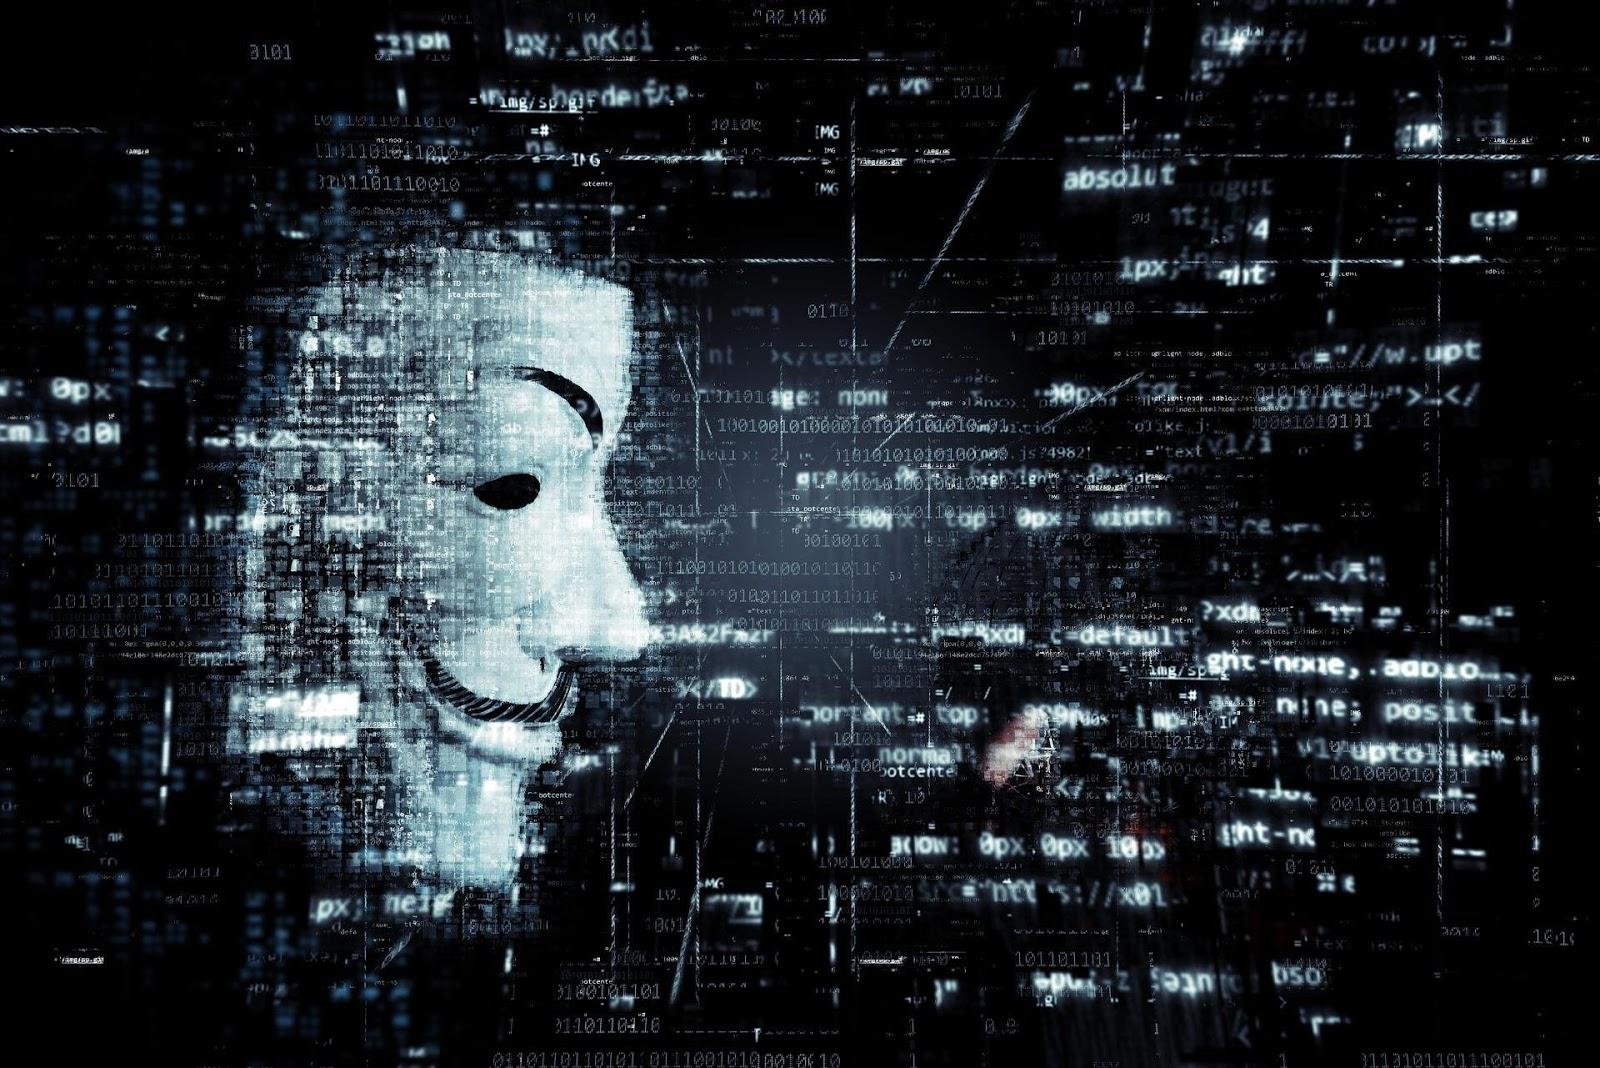 Phishing attacks make your life bad. www.ipagenews.com